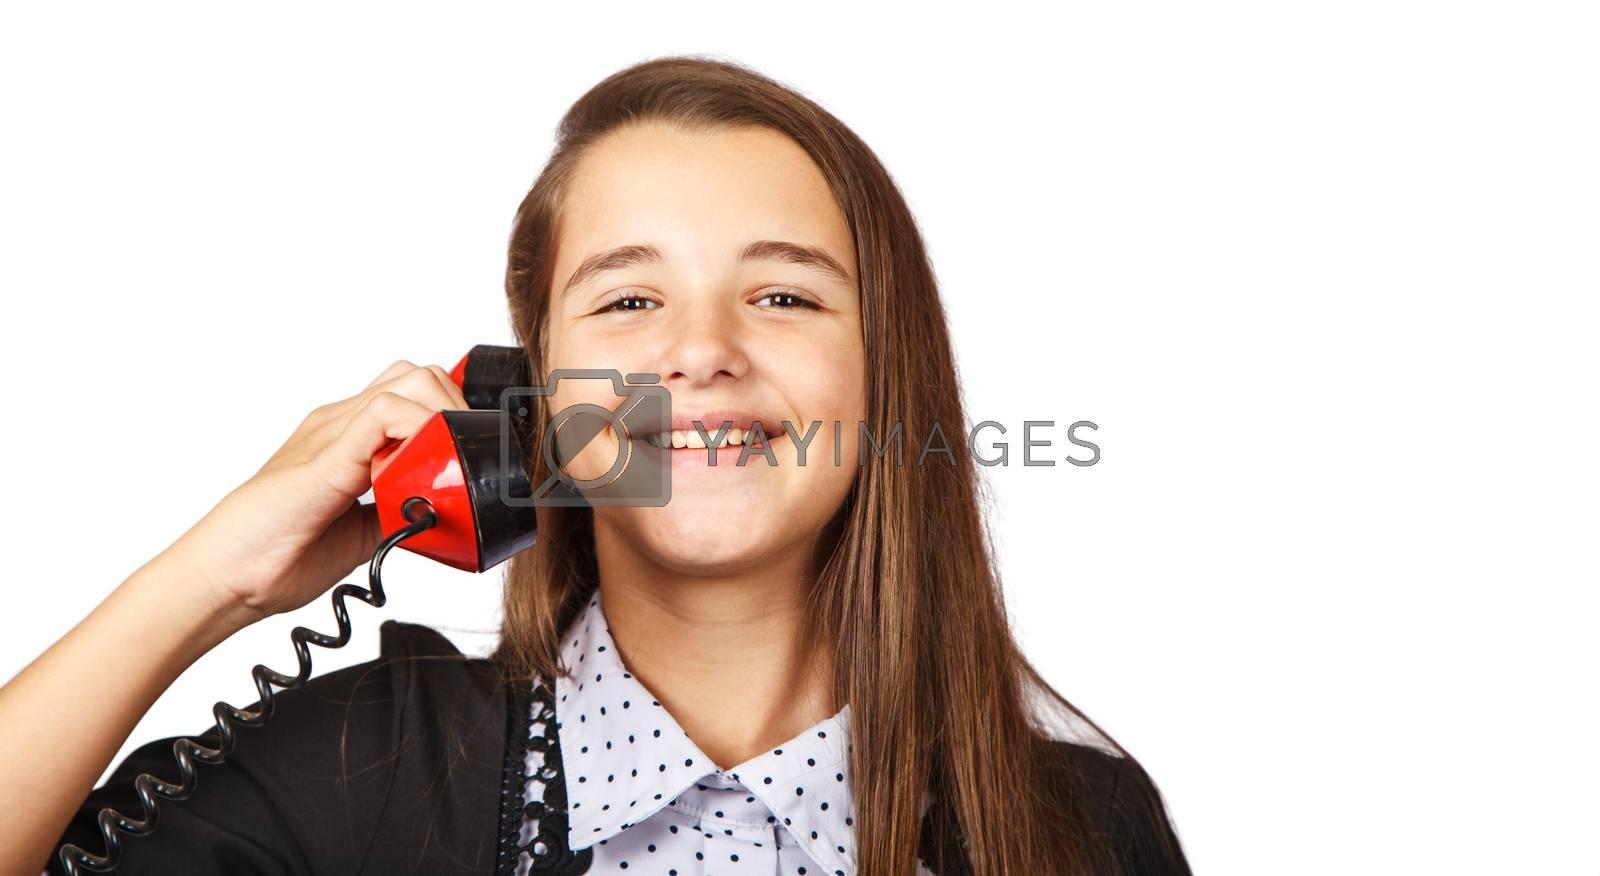 teenage brunette smiling girl talking on red retro telephone closeup on white background